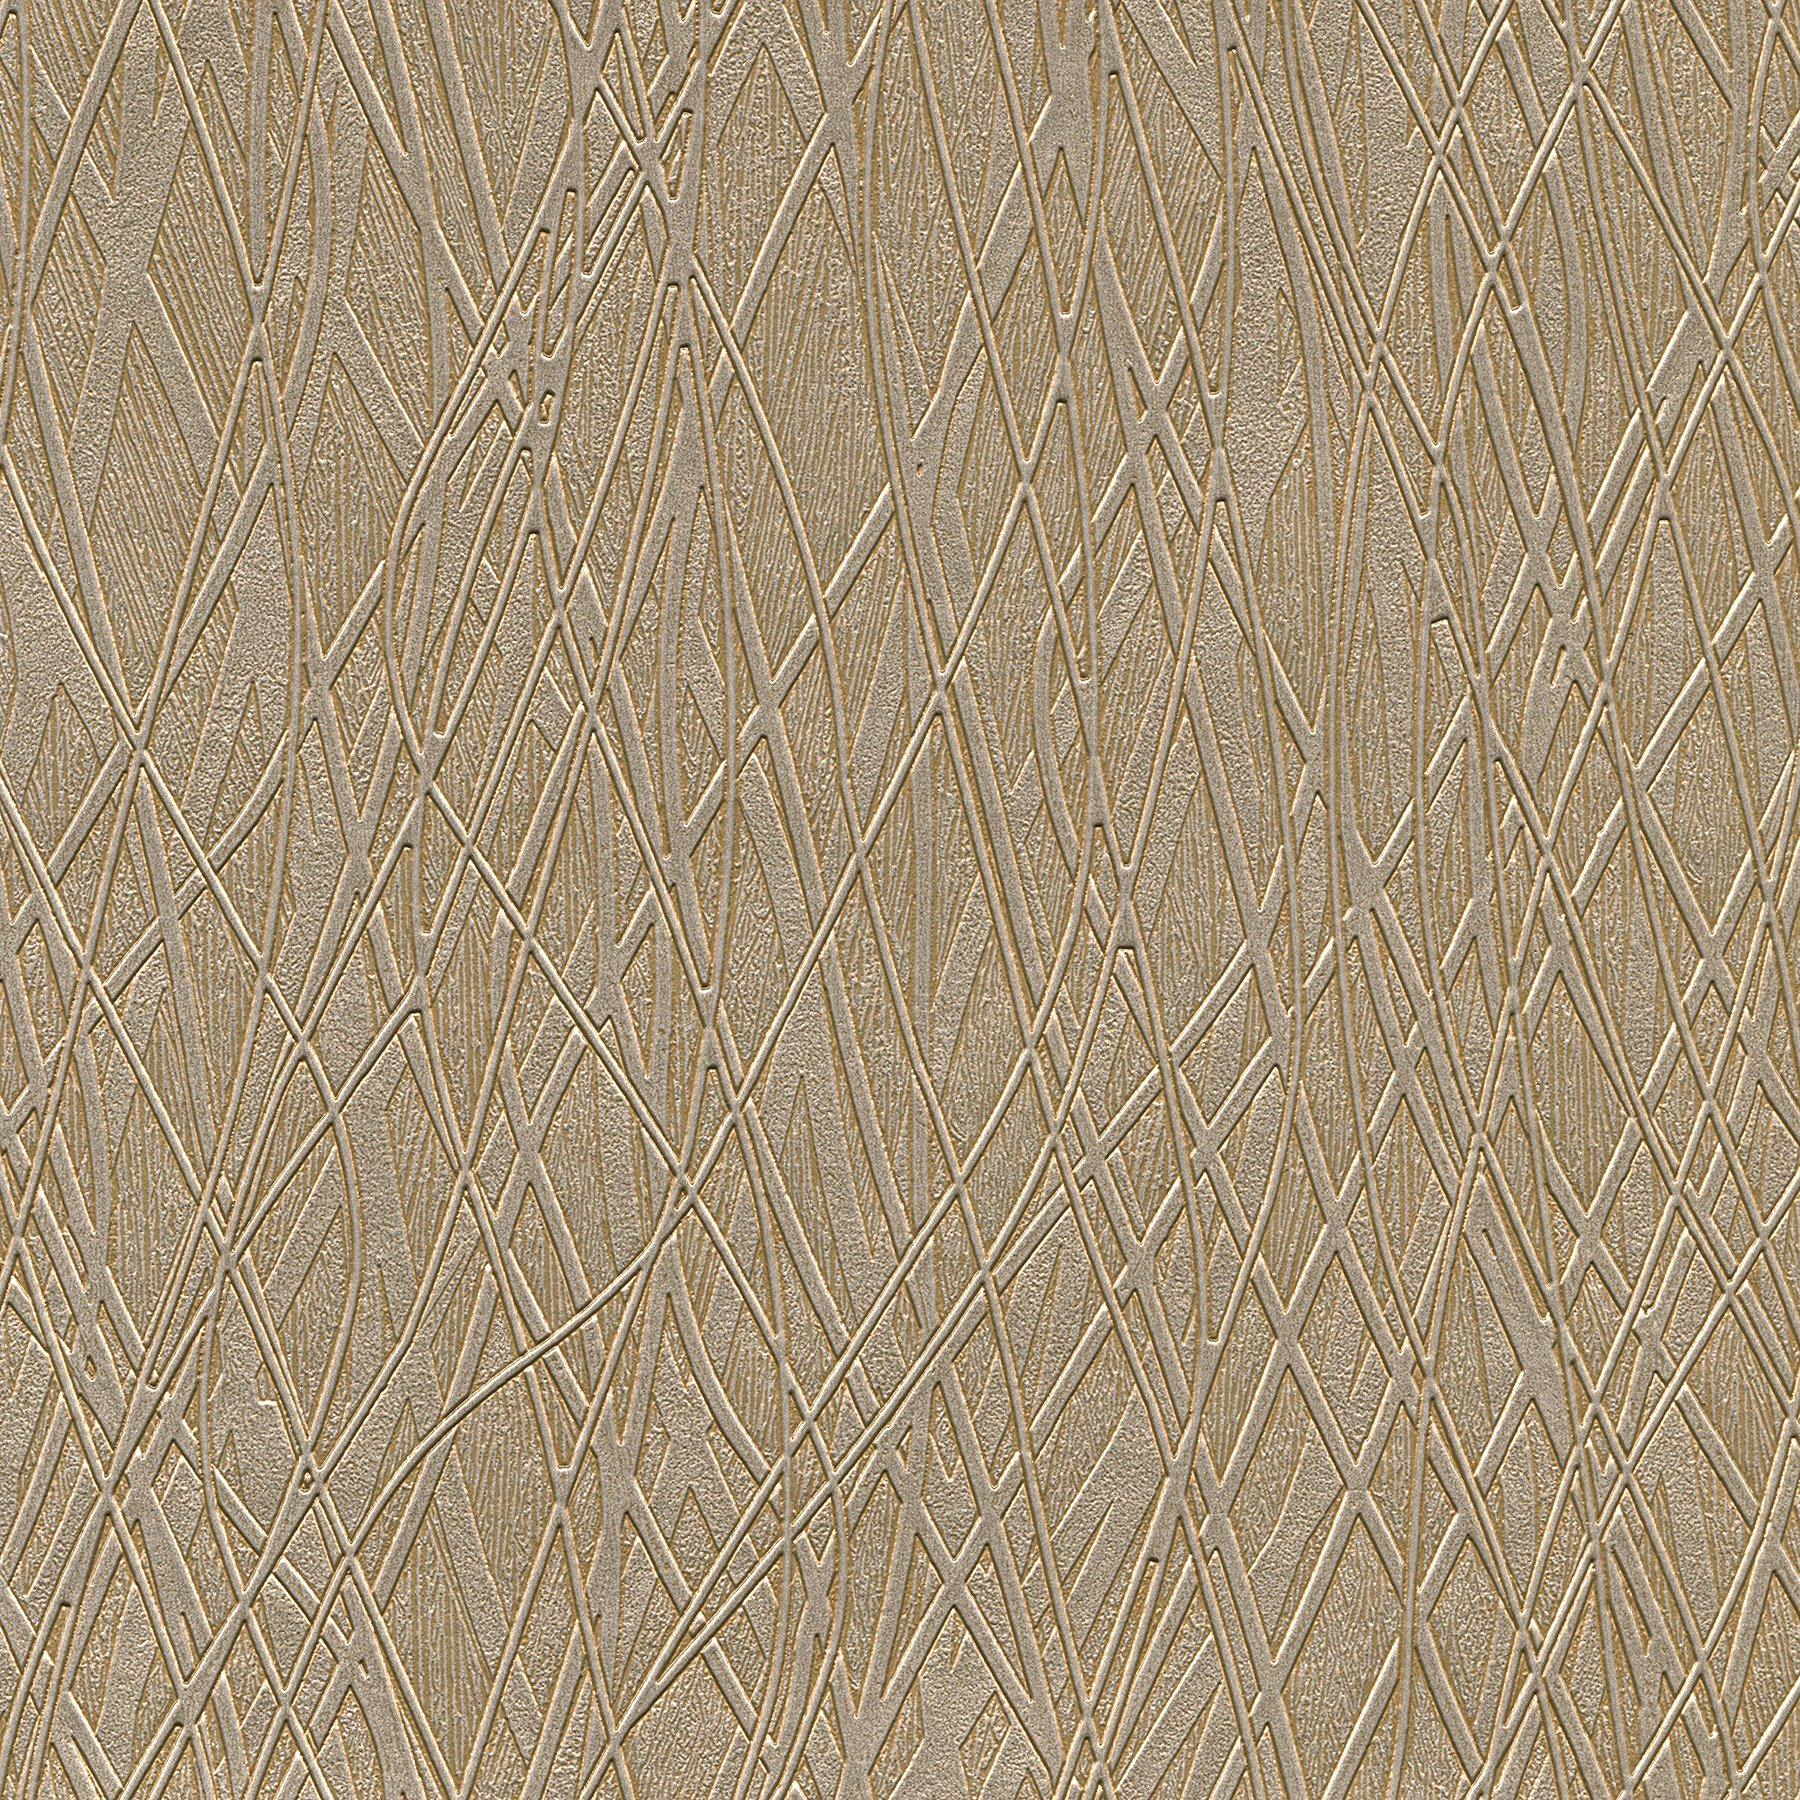 Warner 2758-8012 Allegro Embossed Wallpaper, Bronze by Warner Manufacturing